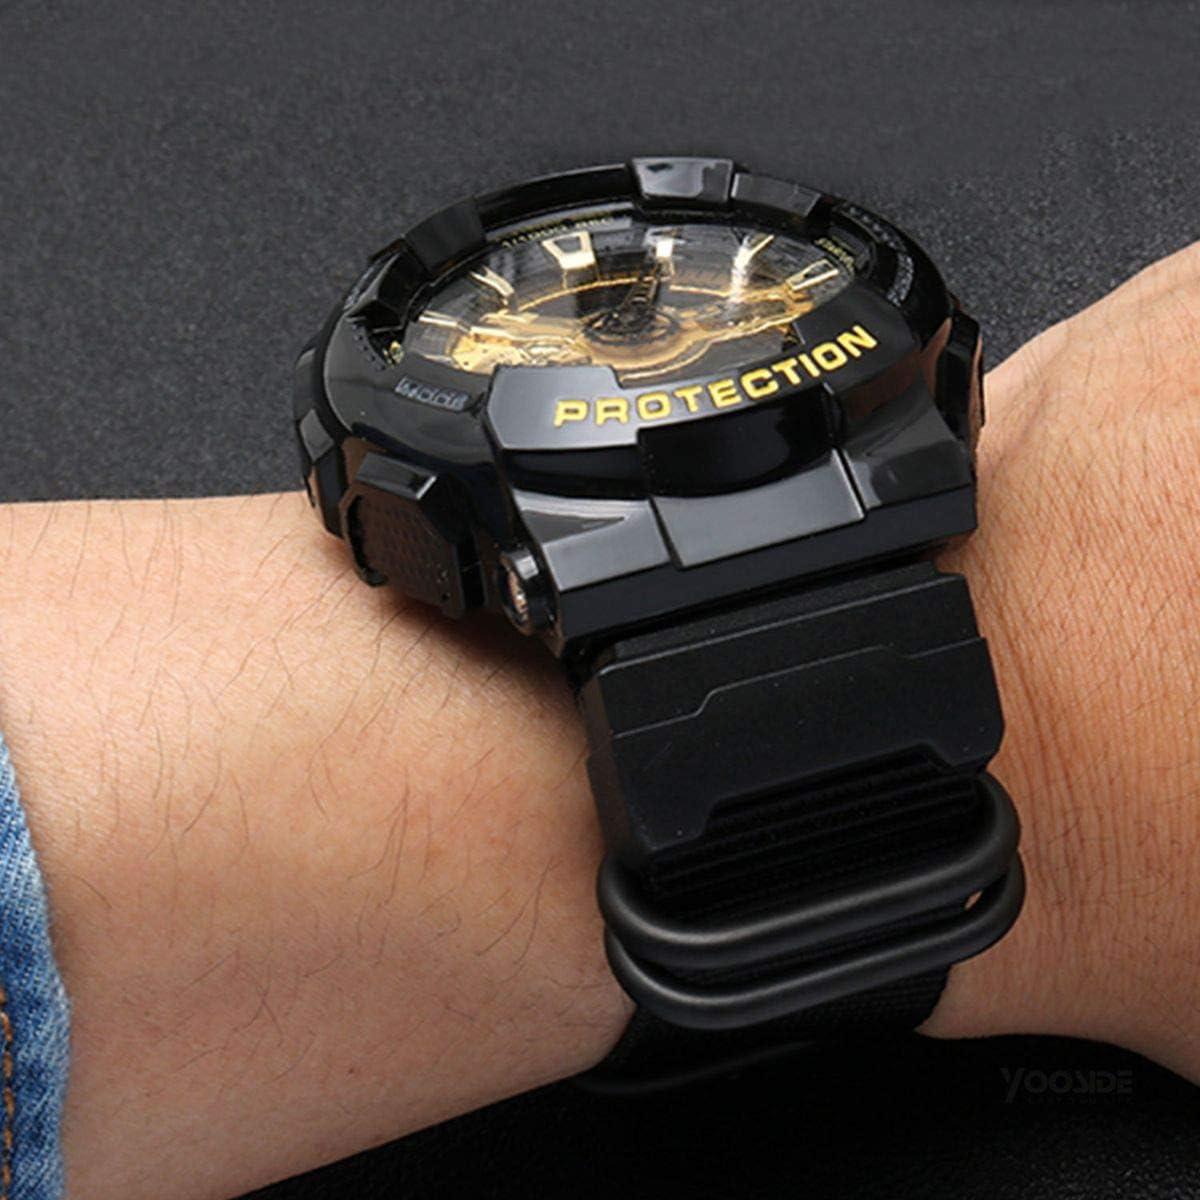 YOOSIDE NATO Nylon Buckle Watch Band for Casio G-SHOCK GW-DW5600(Black): Clothing